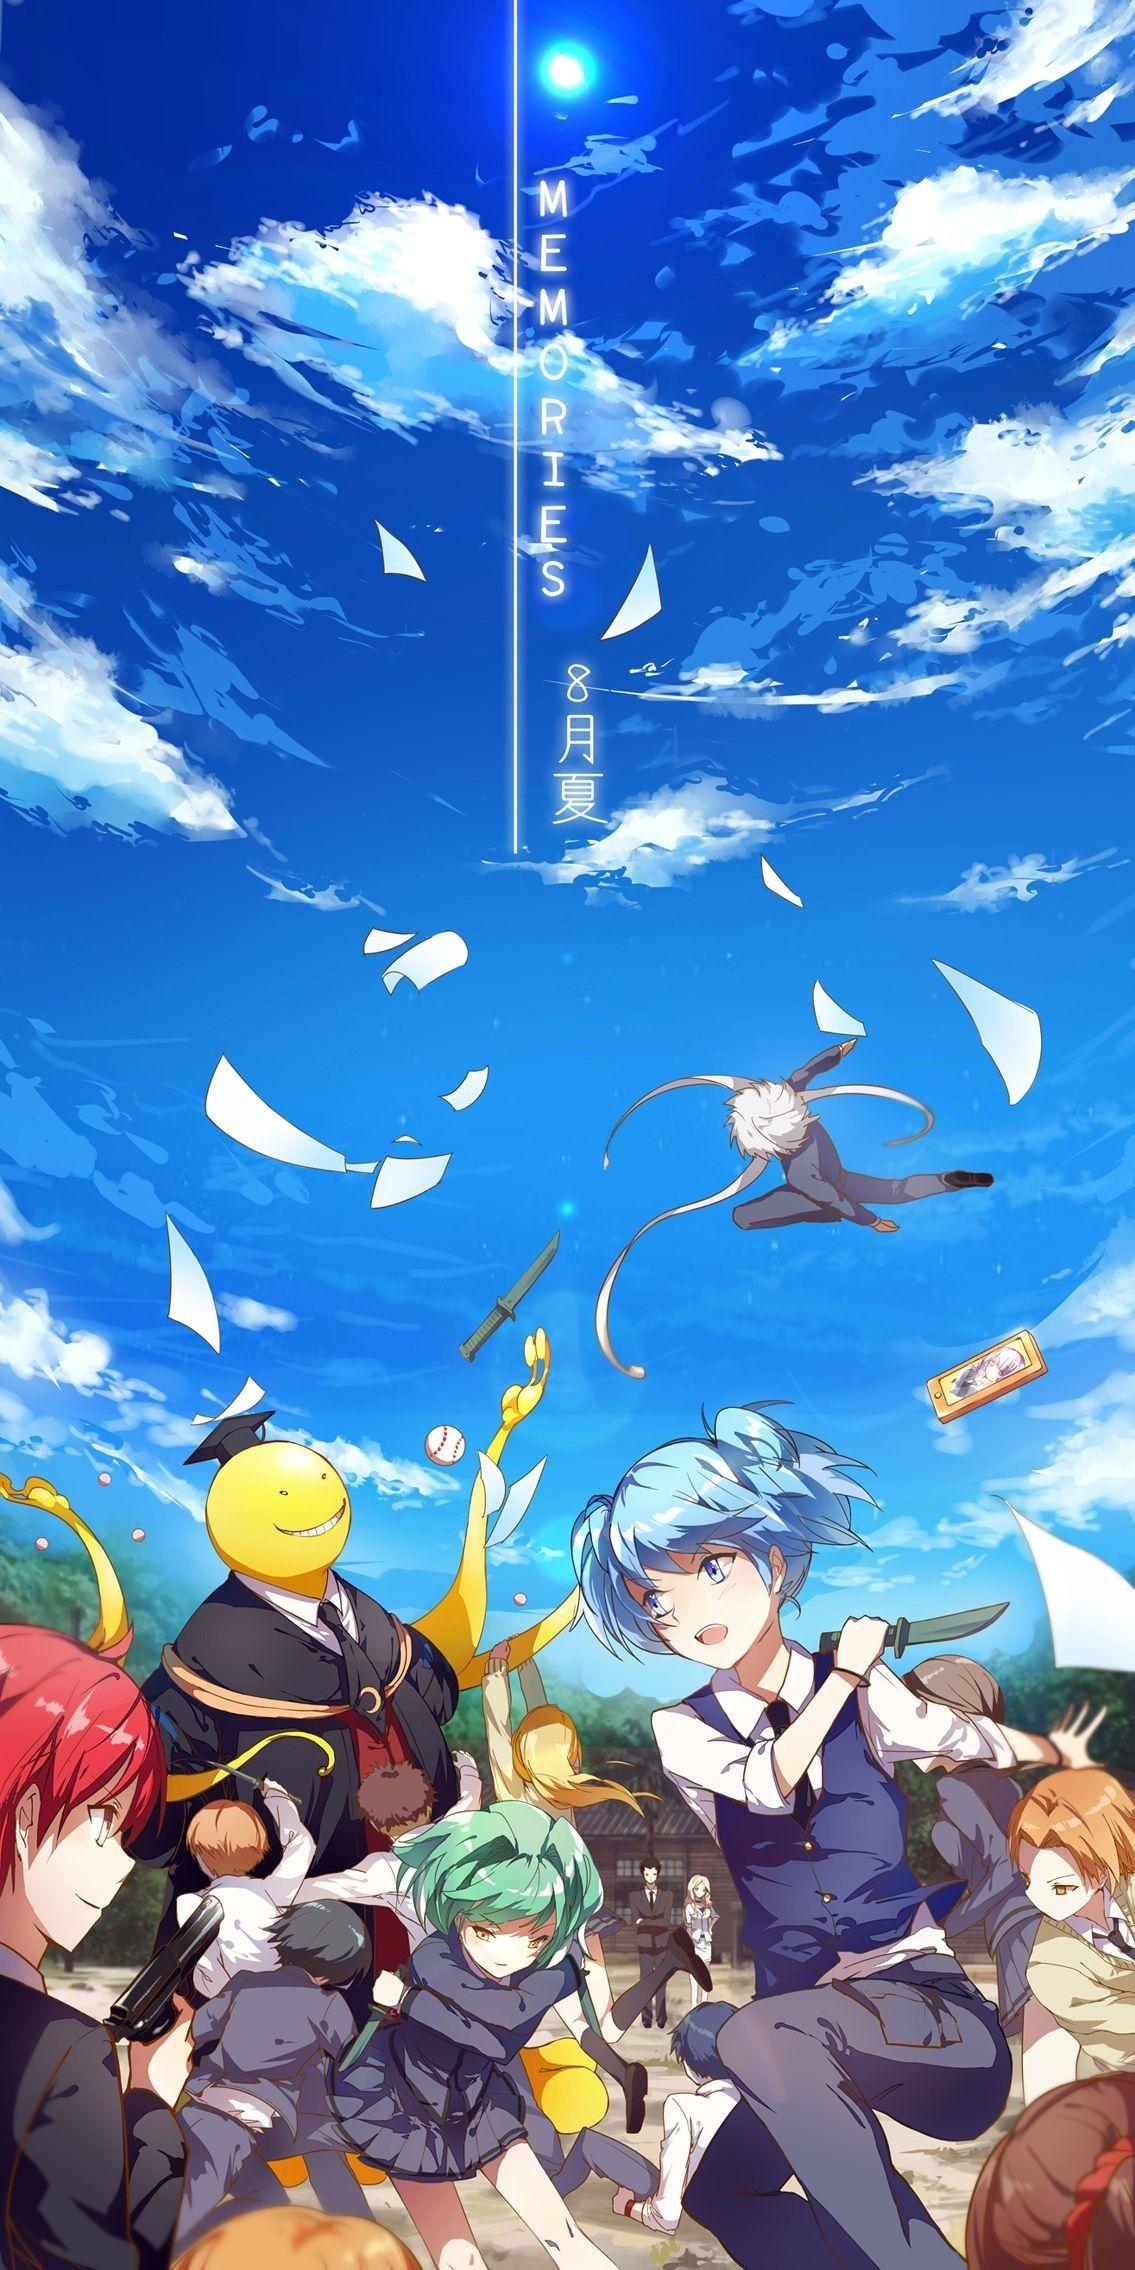 67 Koro Sensei Cute Assassination Classroom Wallpaper In 2020 Anime Wallpaper Anime Classroom Assassination Classroom